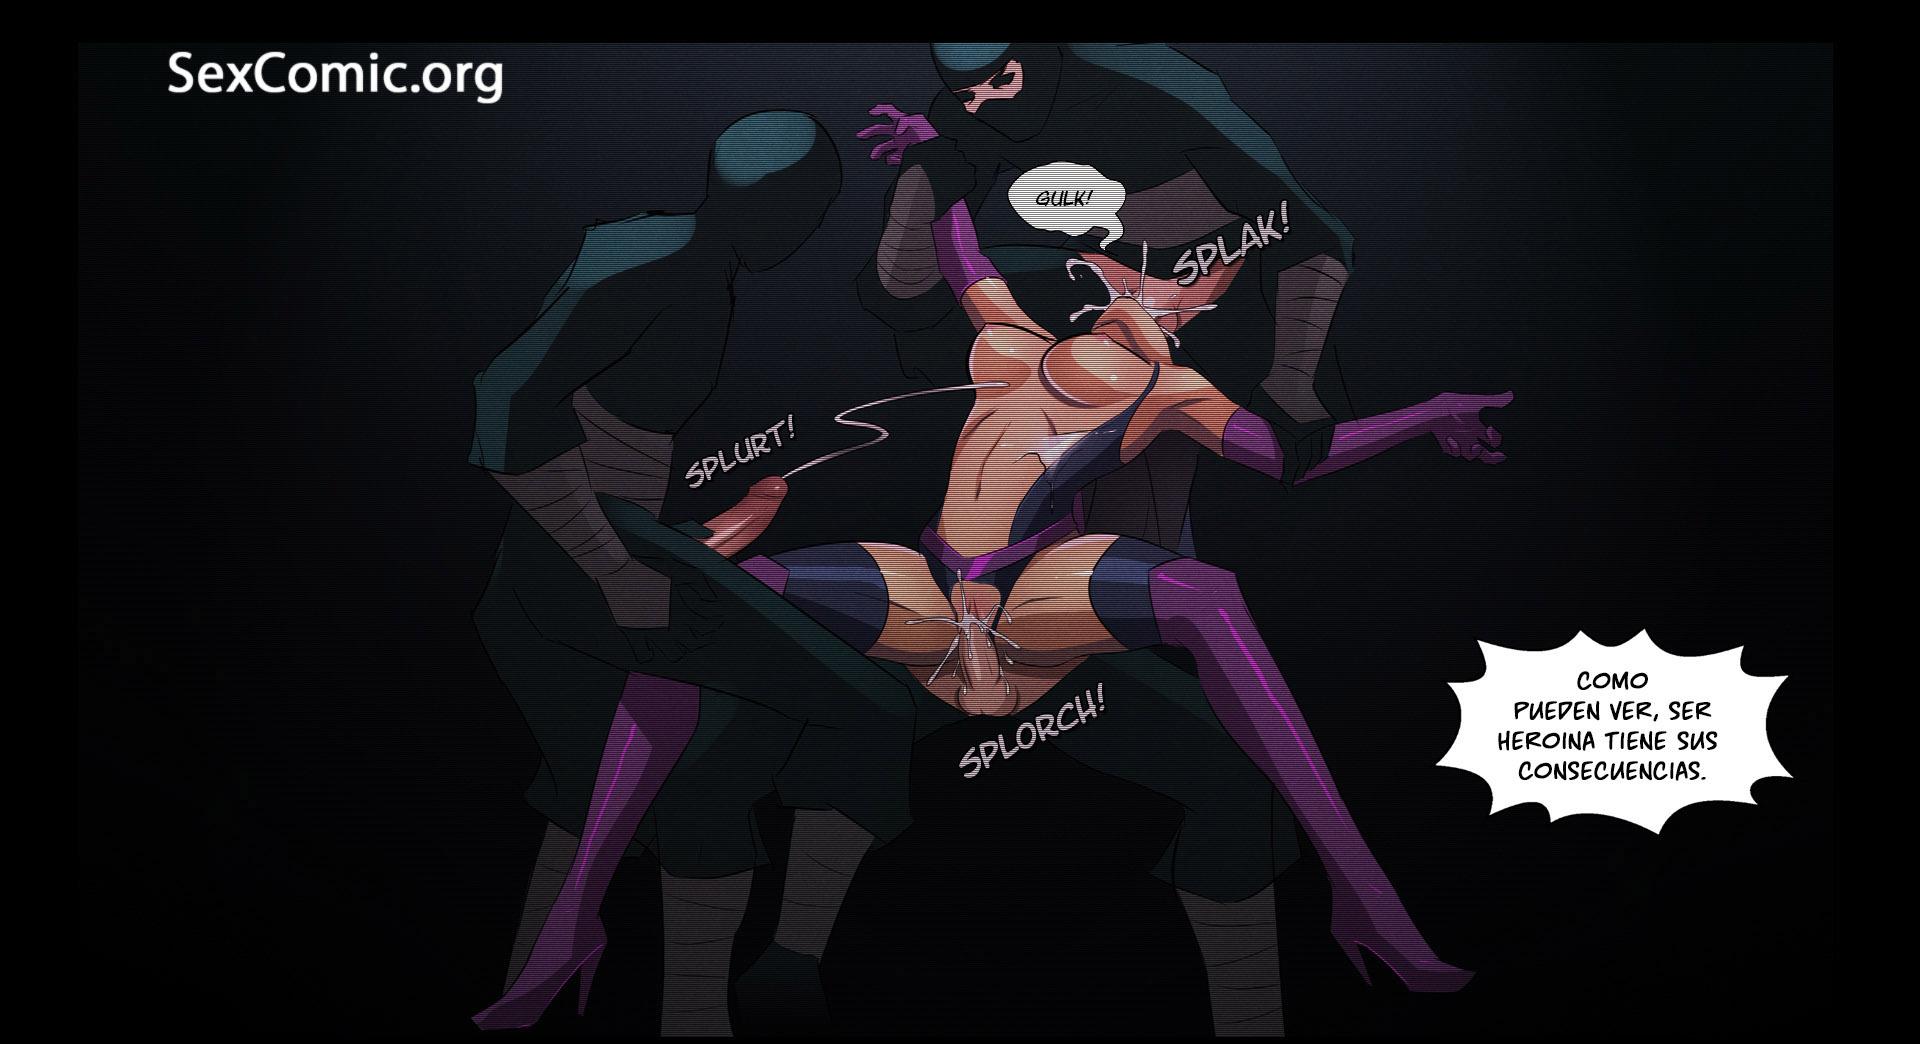 comic-xxx-super-heroes-marvel-historias-eroticas-mangas-sexuales-hentai-videos-pono-comics-de-incesto-gratis-17